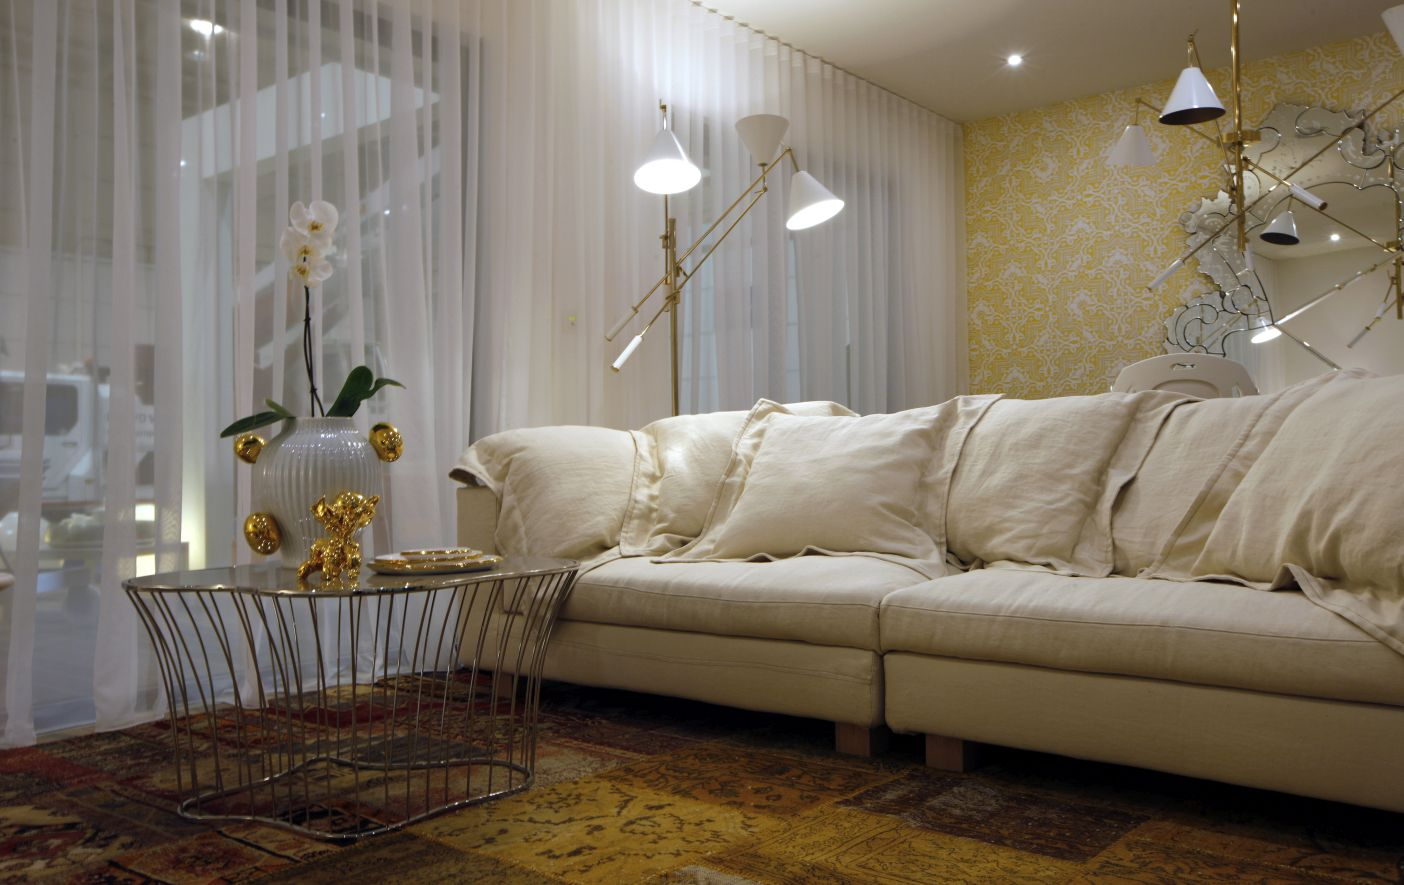 1tralhao-gallery-casa-ideal-boca-do-lobo-project-02.jpg